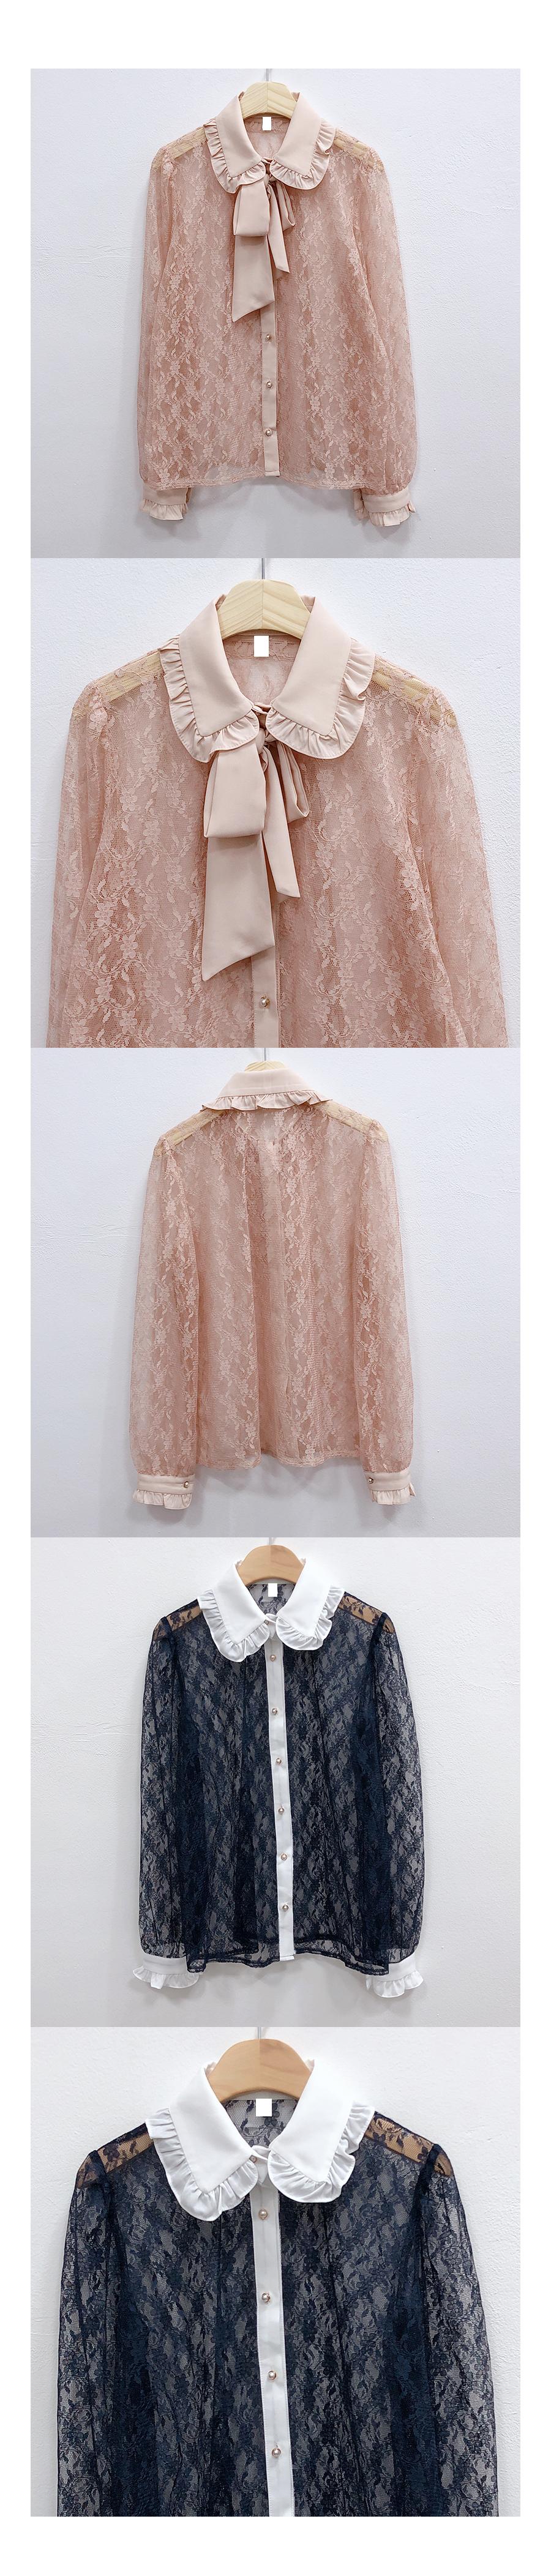 French lace ribbon blouse